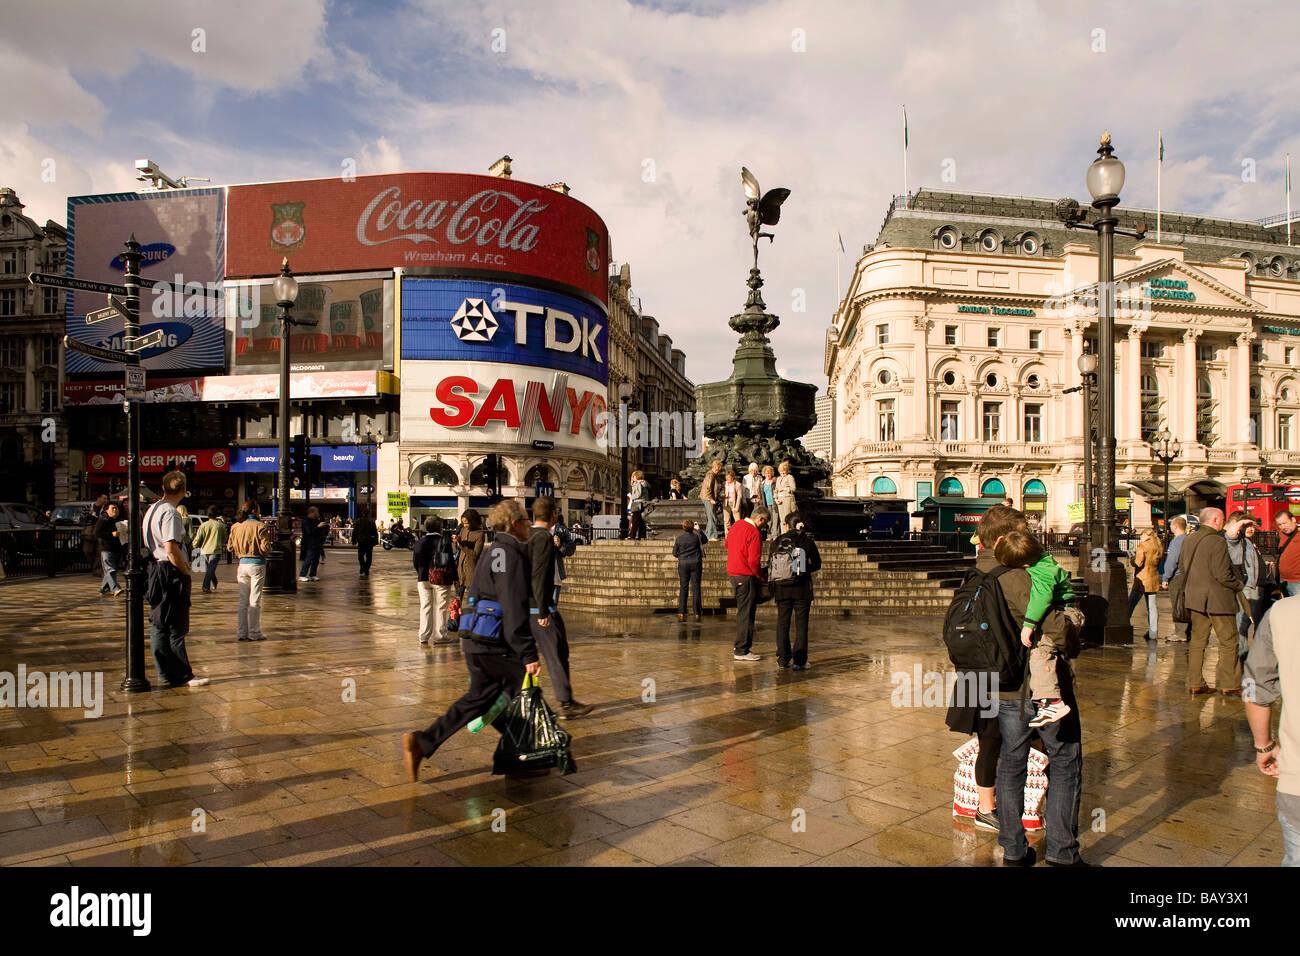 Picadilly Circus, London, England, Europe - Stock Image